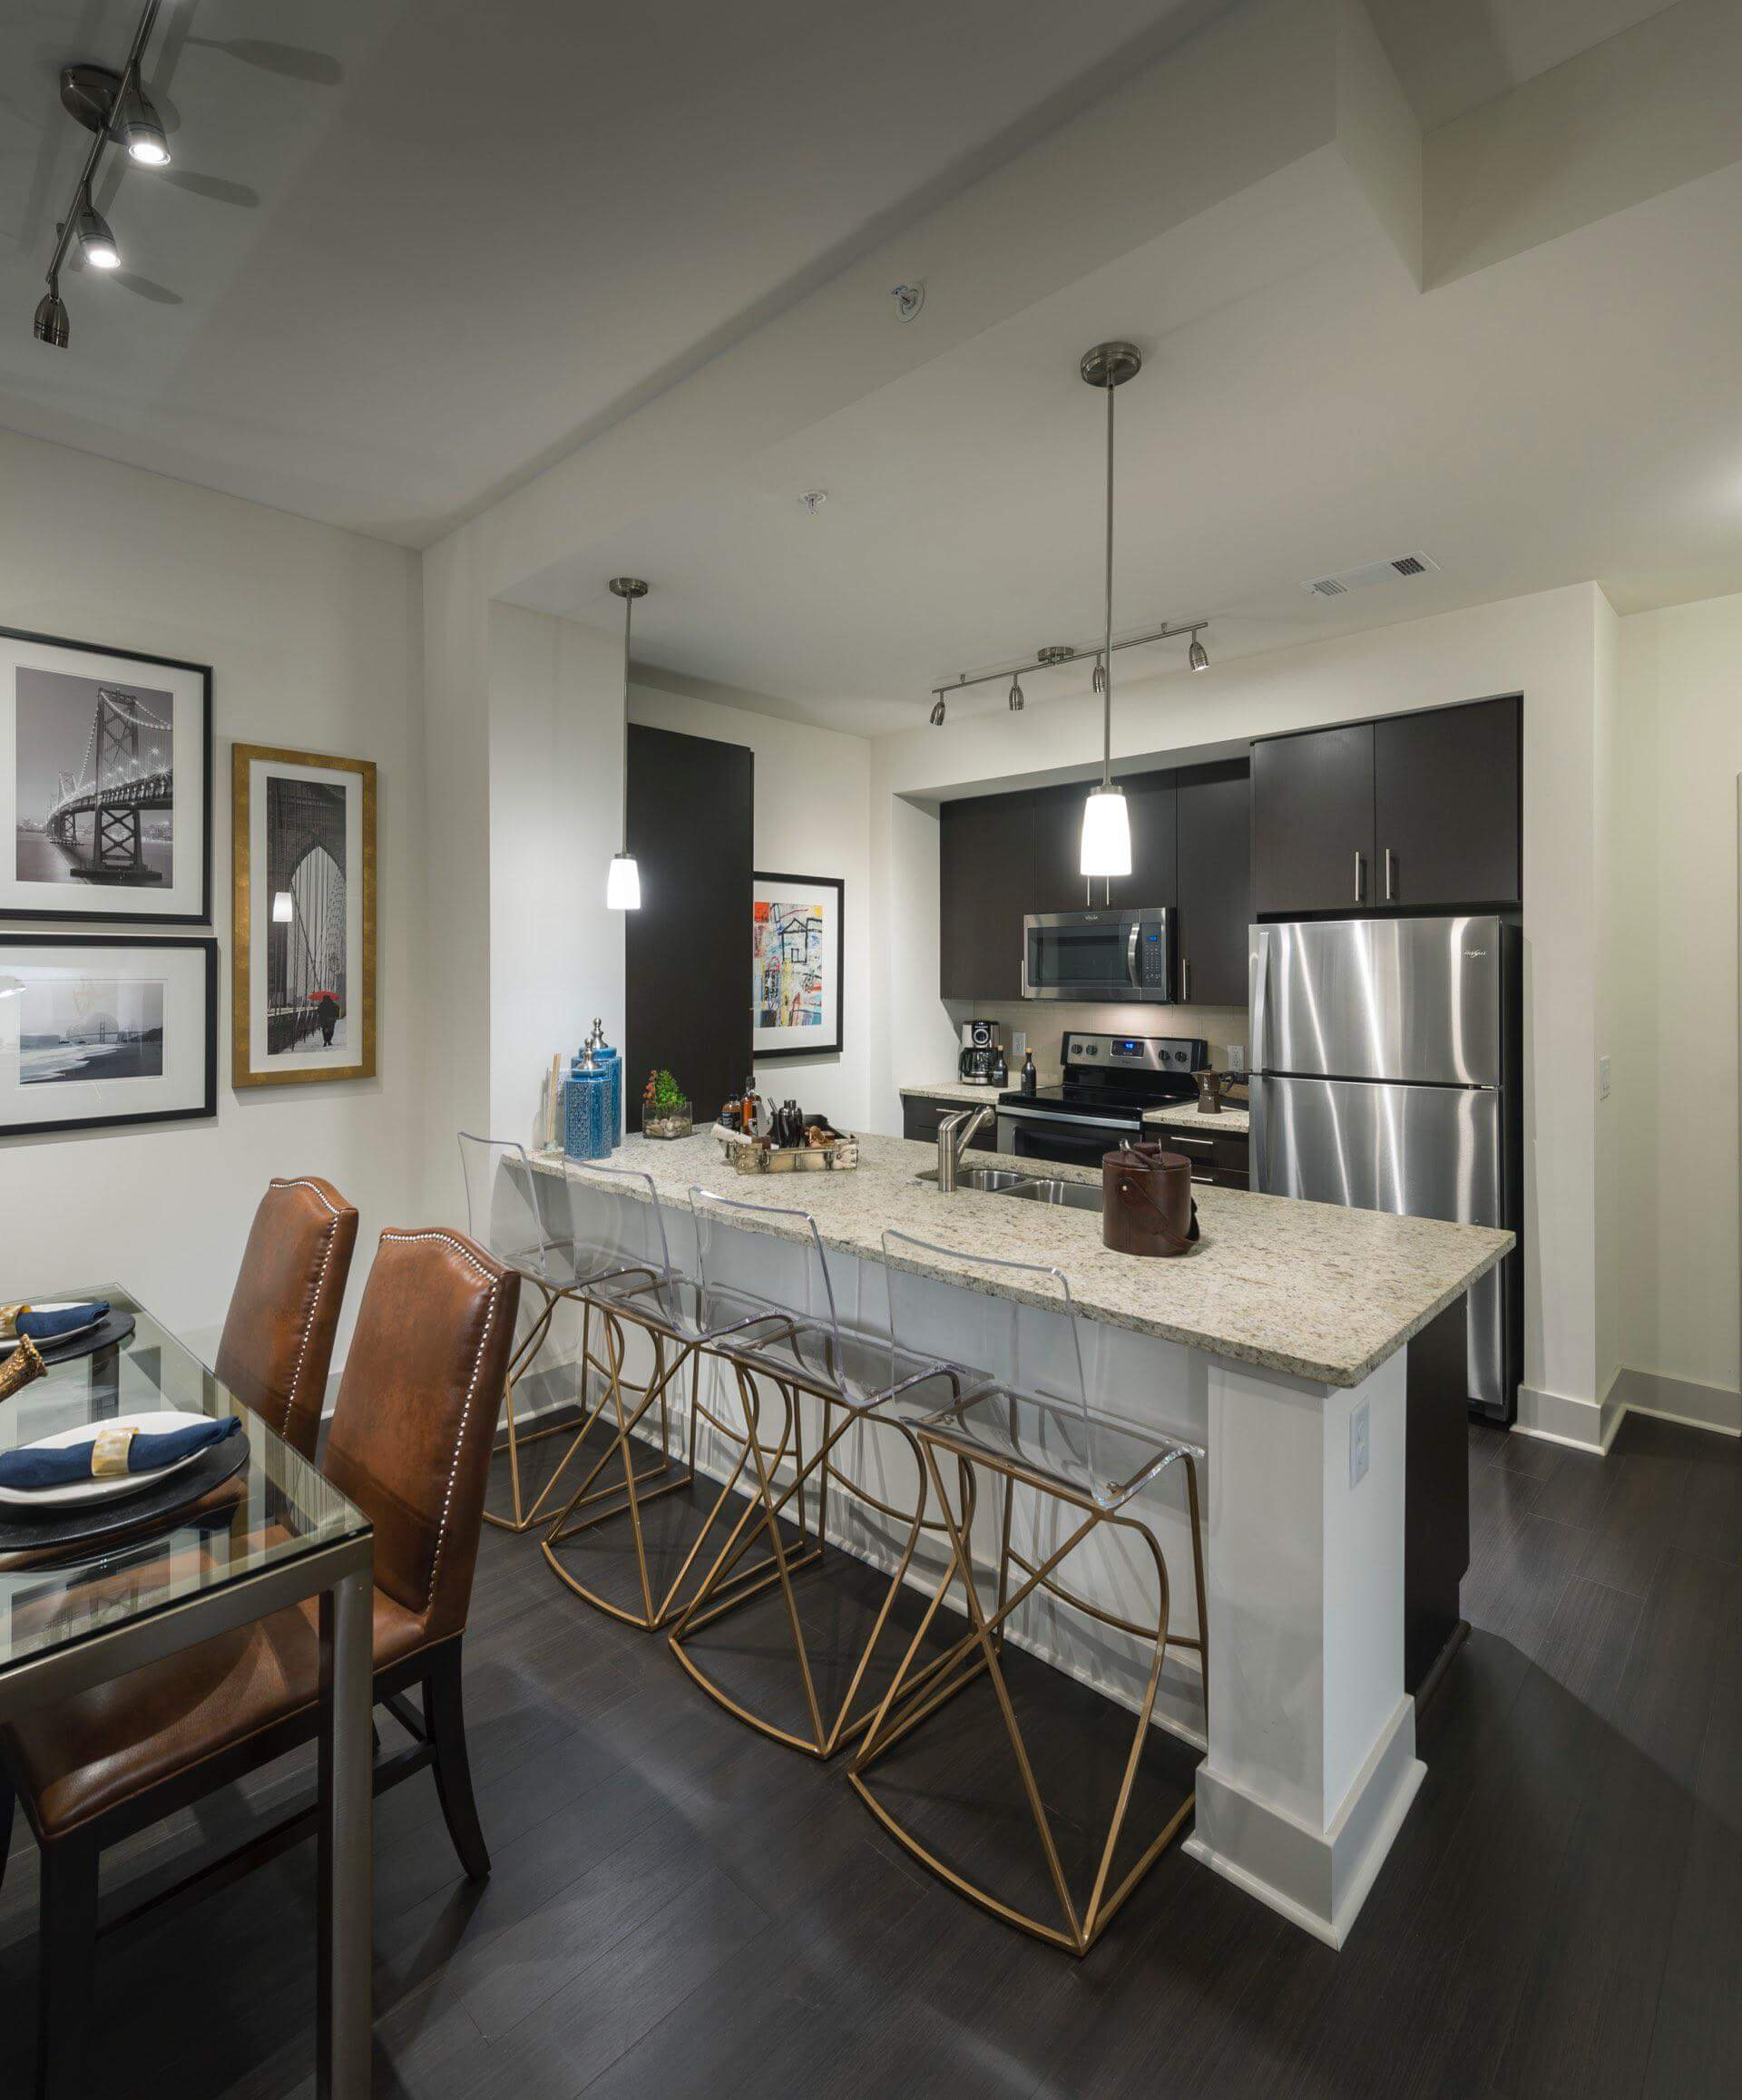 Designer custom cabinetry & spacious kitchen islands